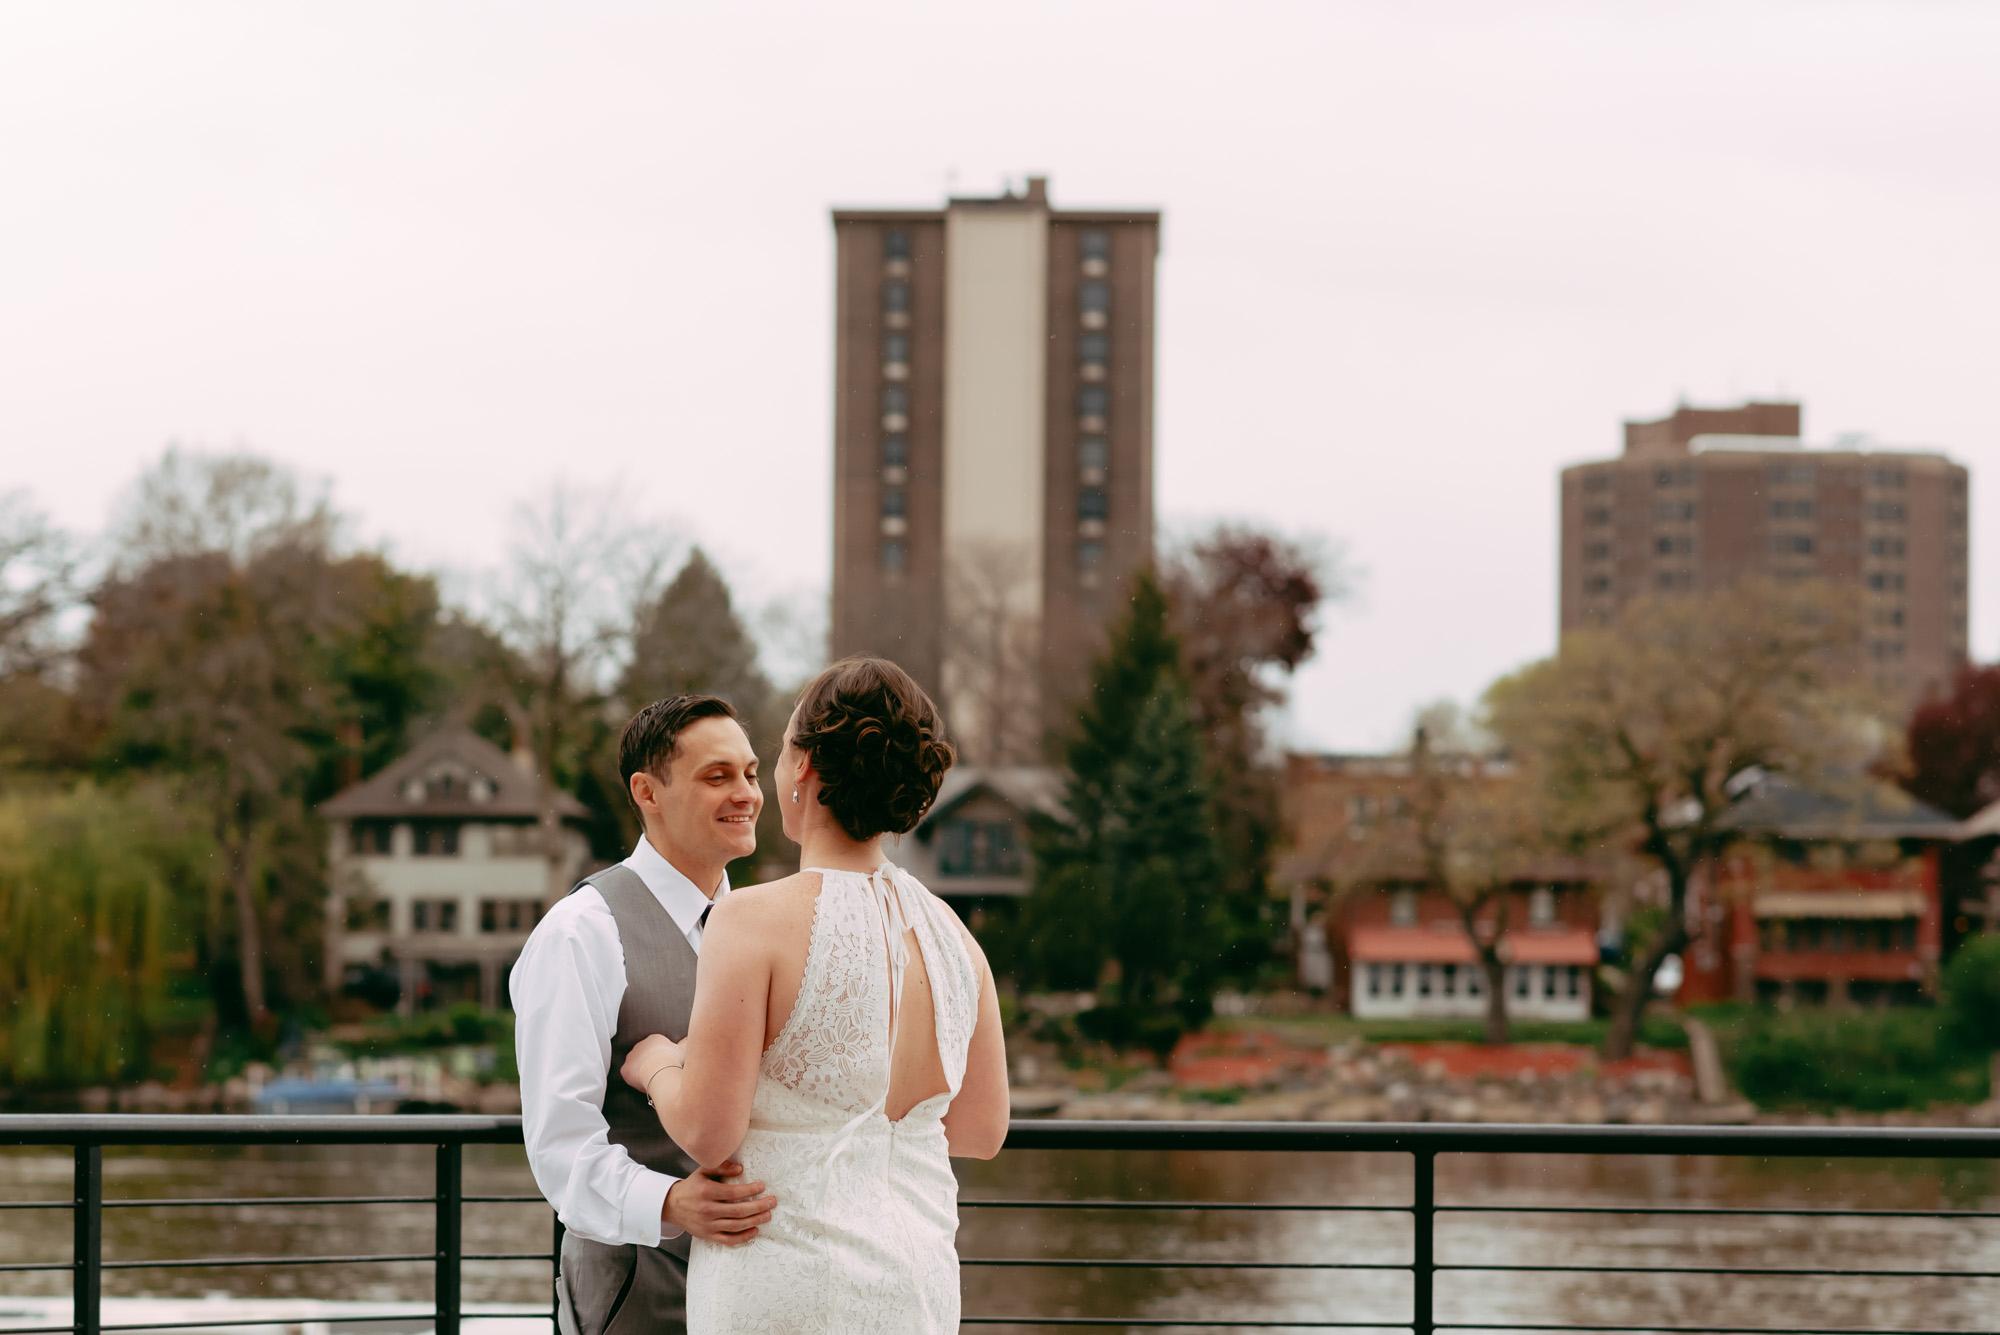 prairie-street-brewhouse-wedding-Rockford-IL-wedding-photographers-58.jpg